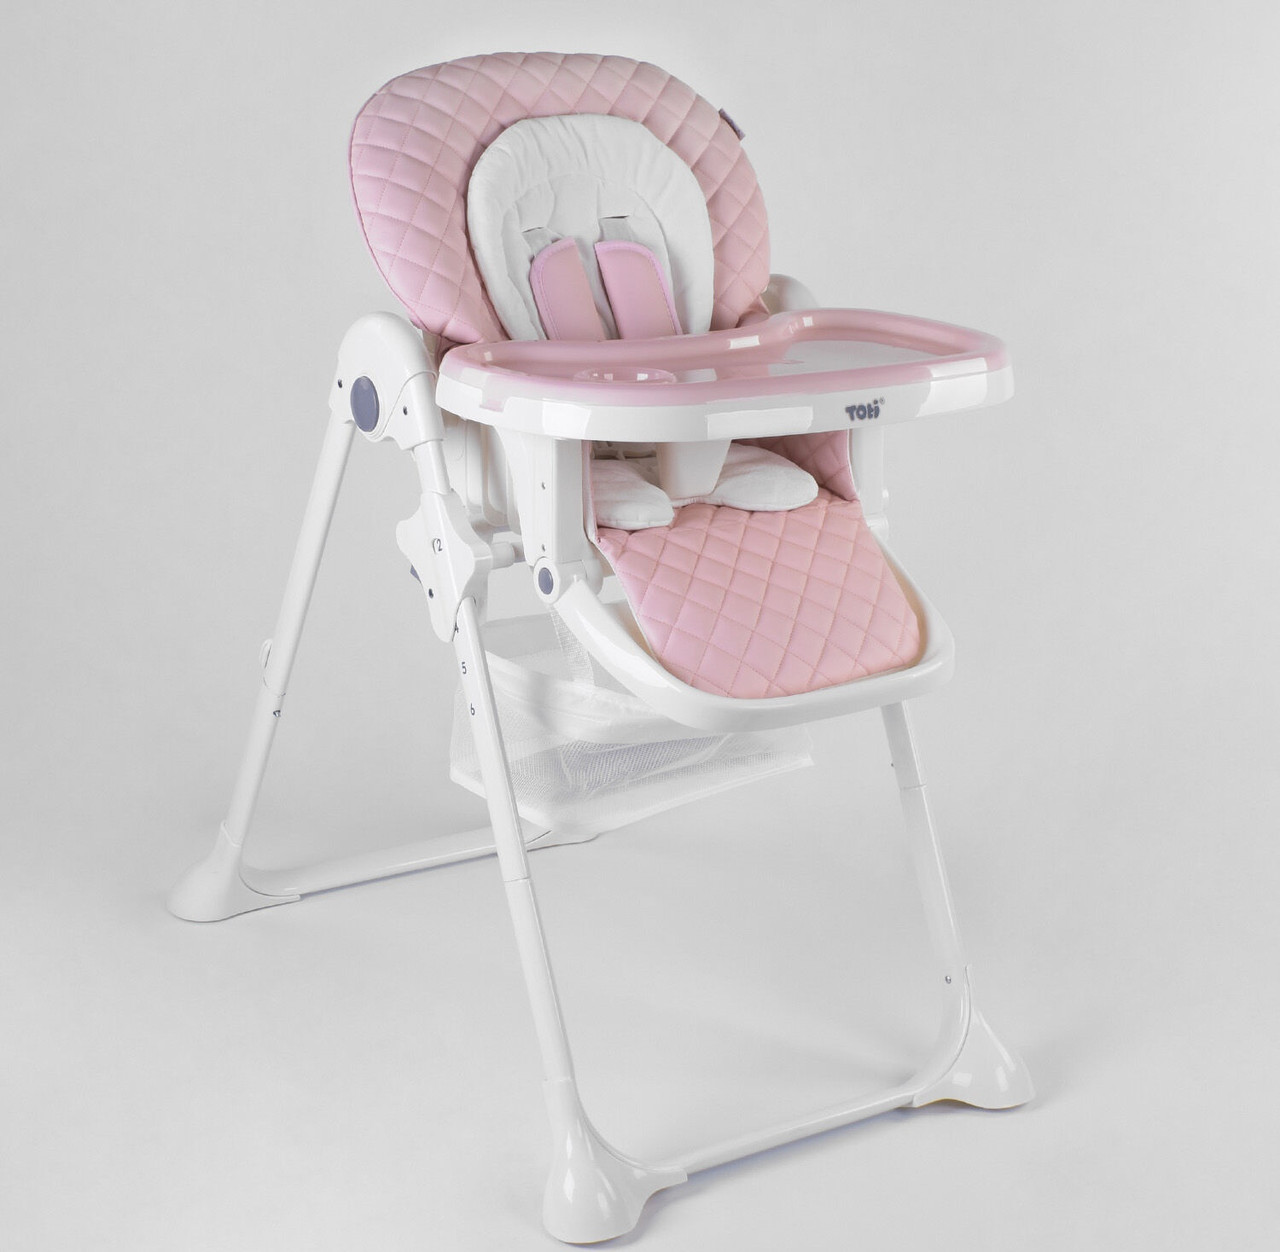 Детский стульчик для кормления Toti W-80108